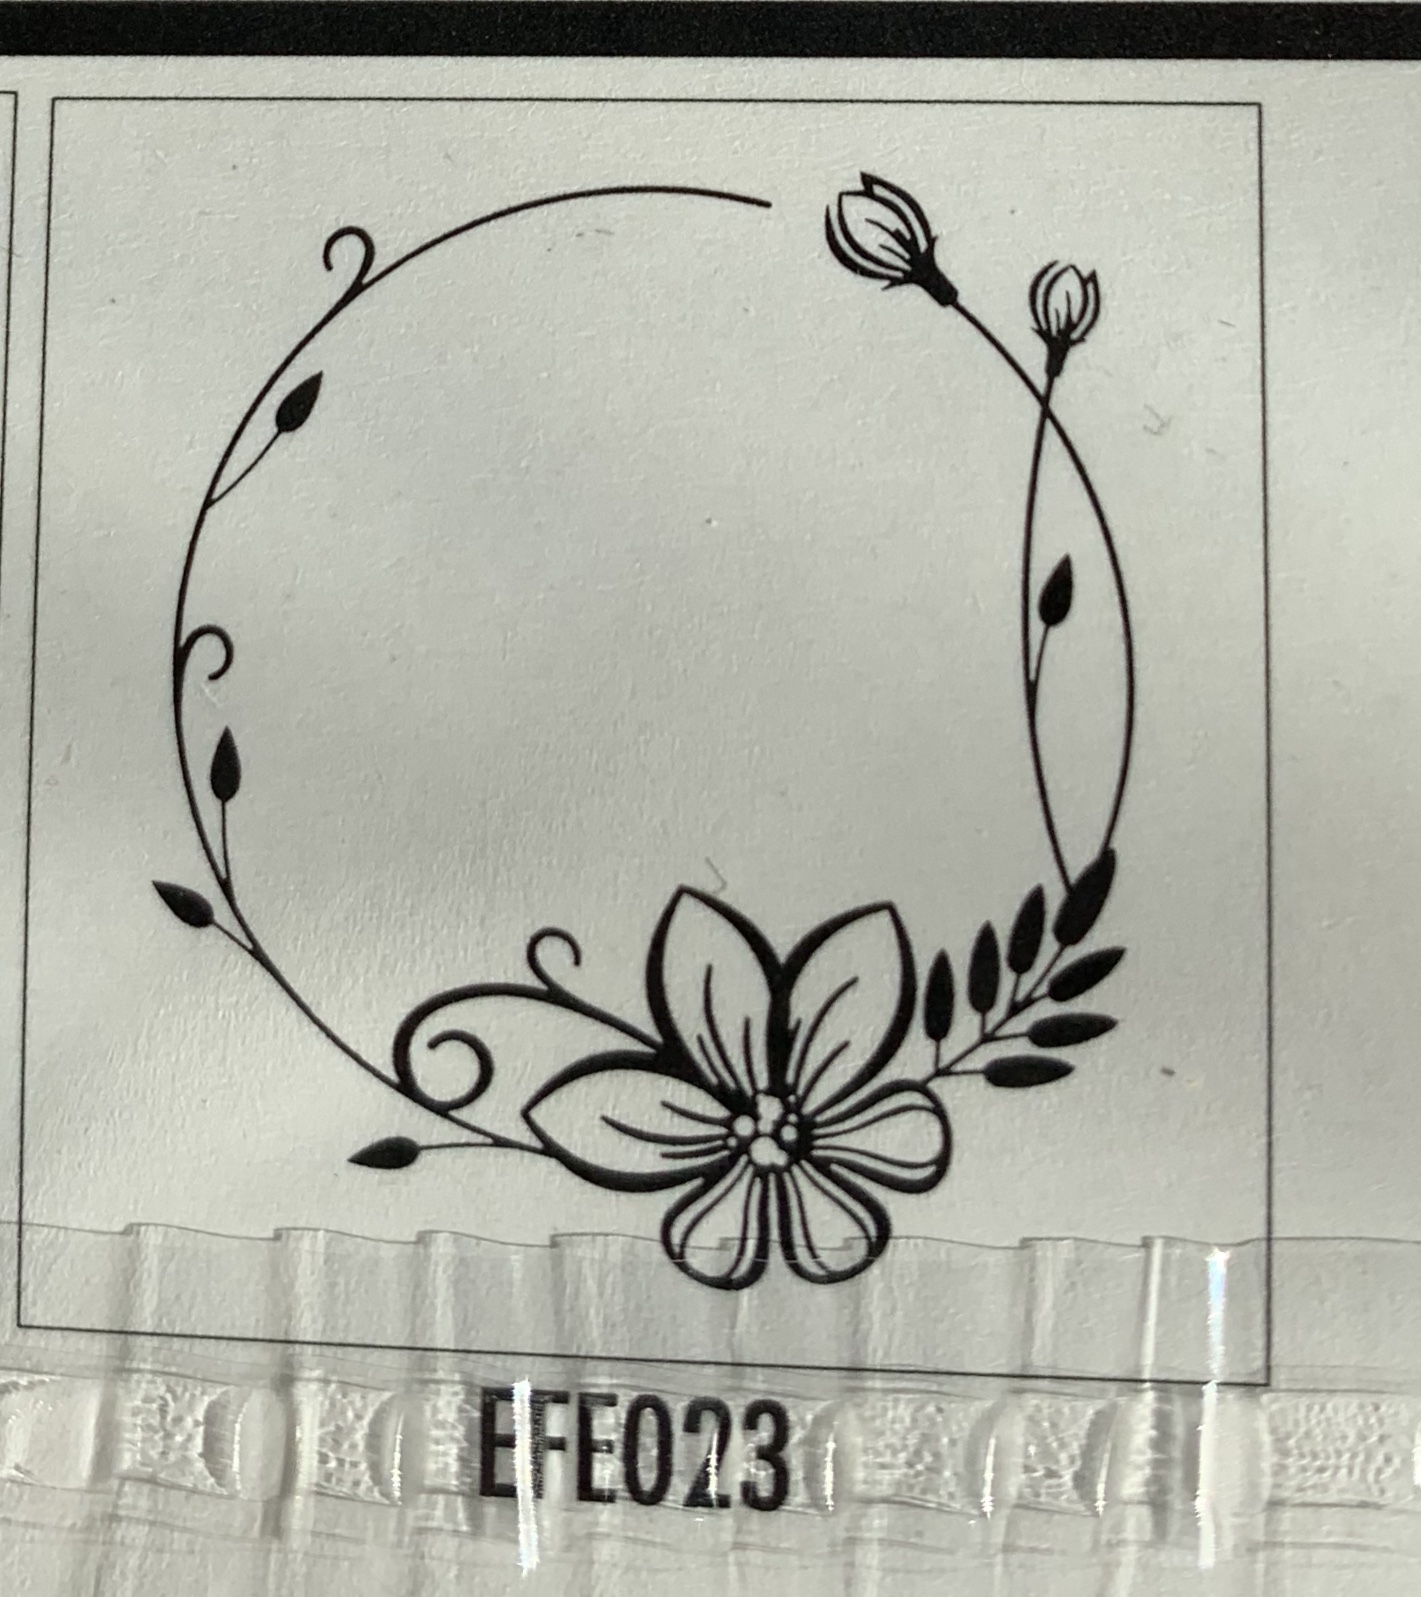 6FCA8F40-8700-4486-975A-CA98CC4C770C